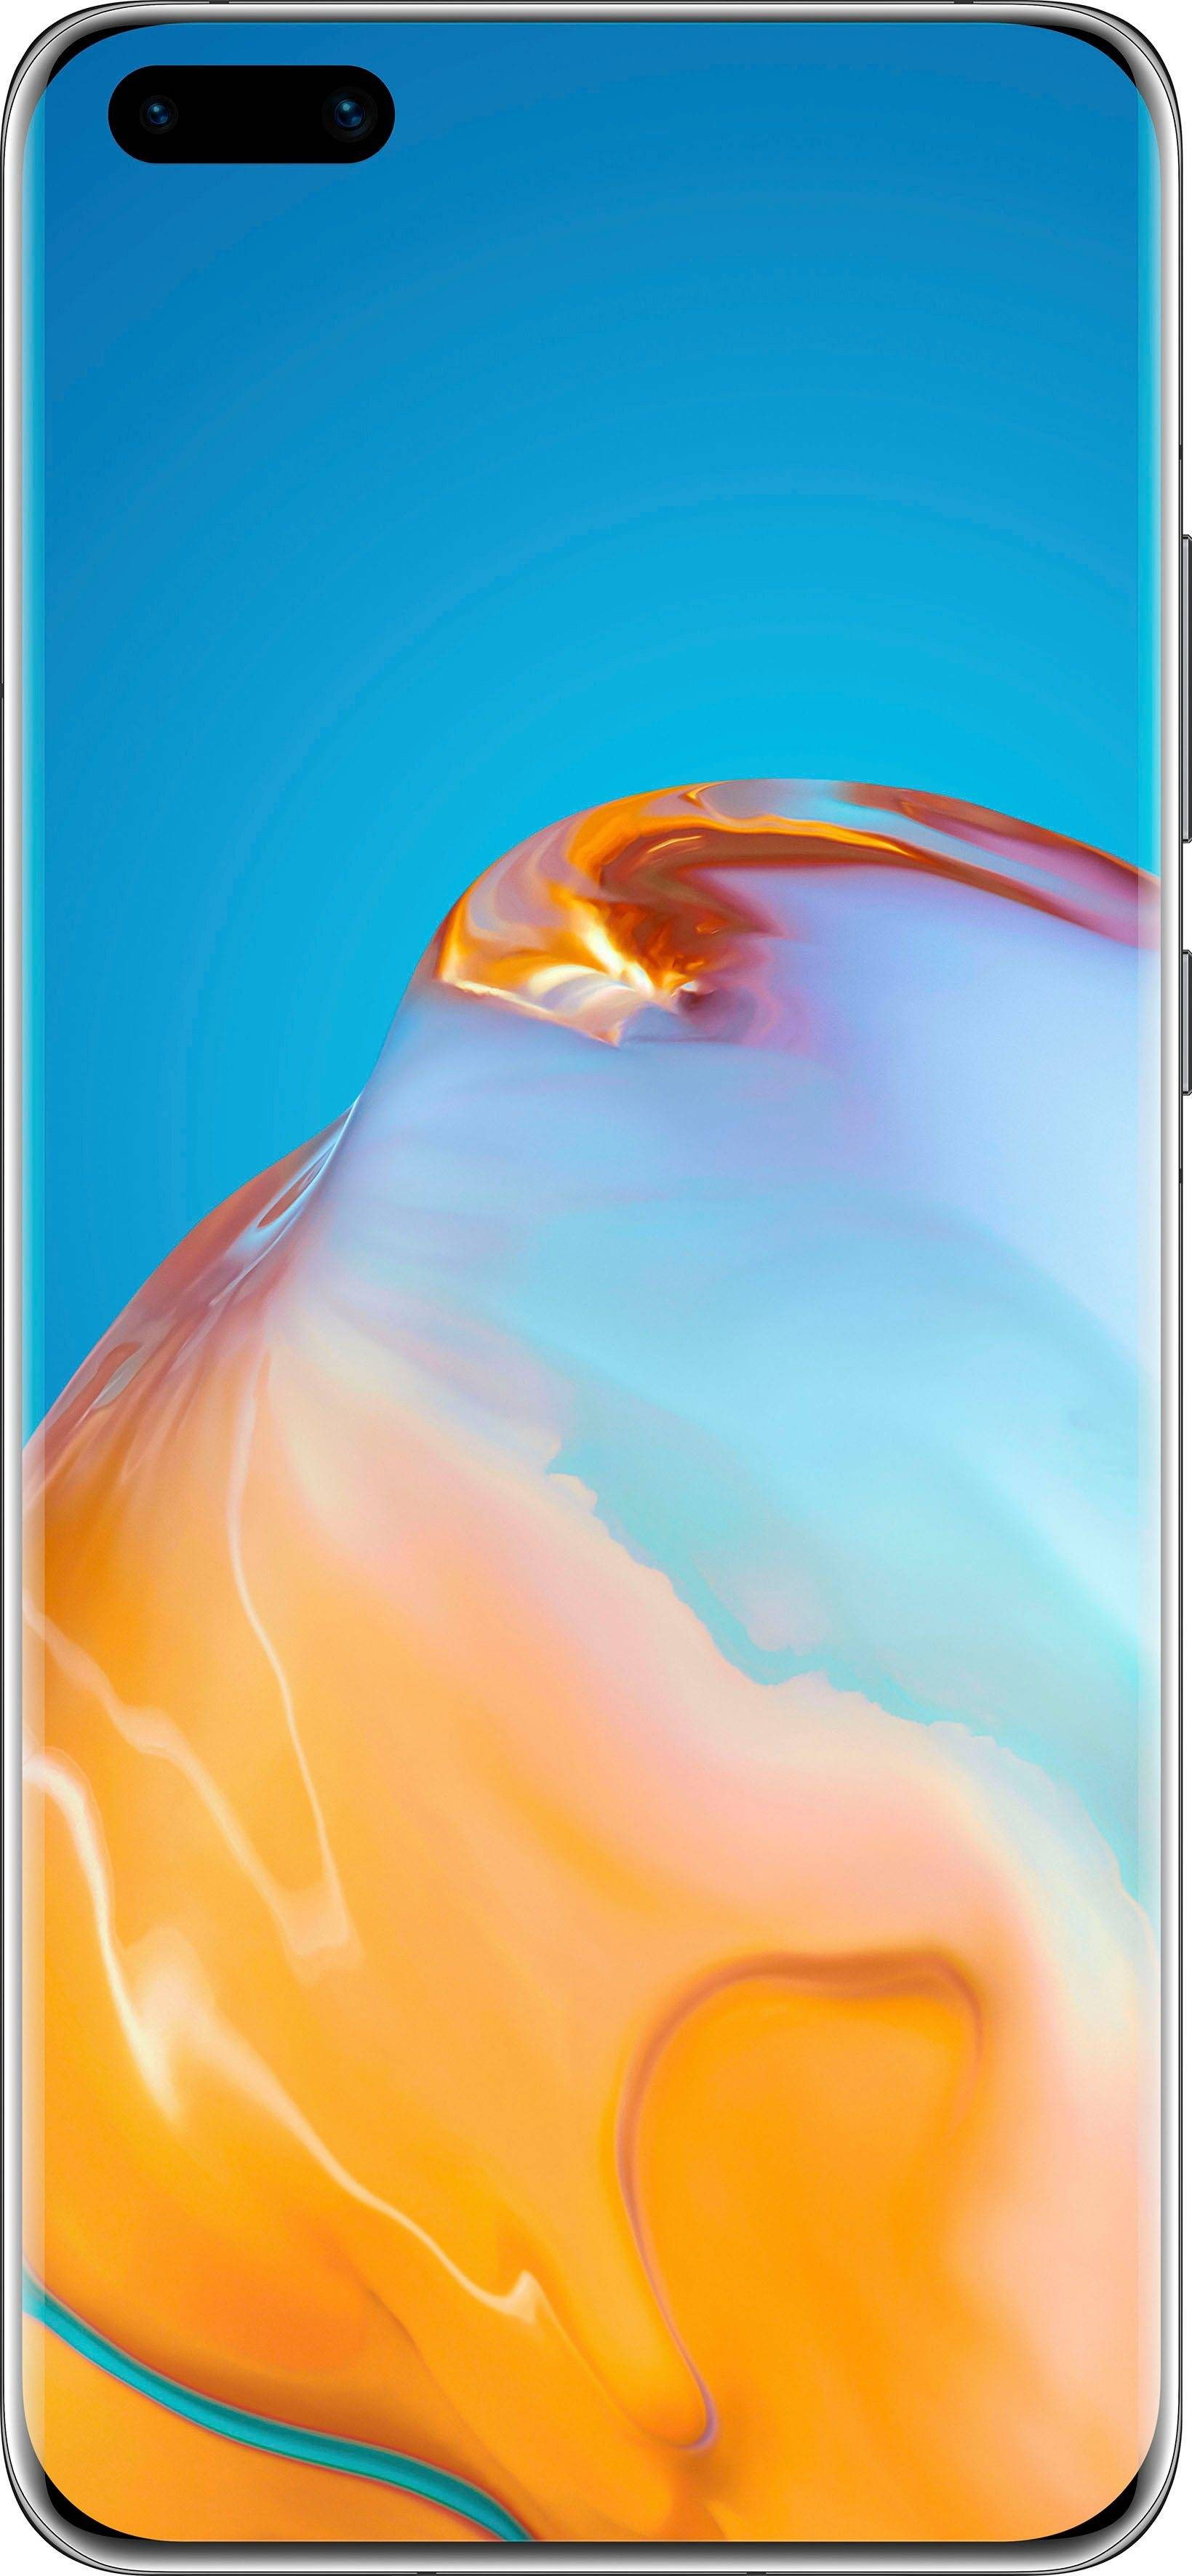 Huawei P40 Pro+ 5G Smartphone (16,7 cm/6,58 Zoll, 512 GB Speicherplatz, 50 MP Kamera), black